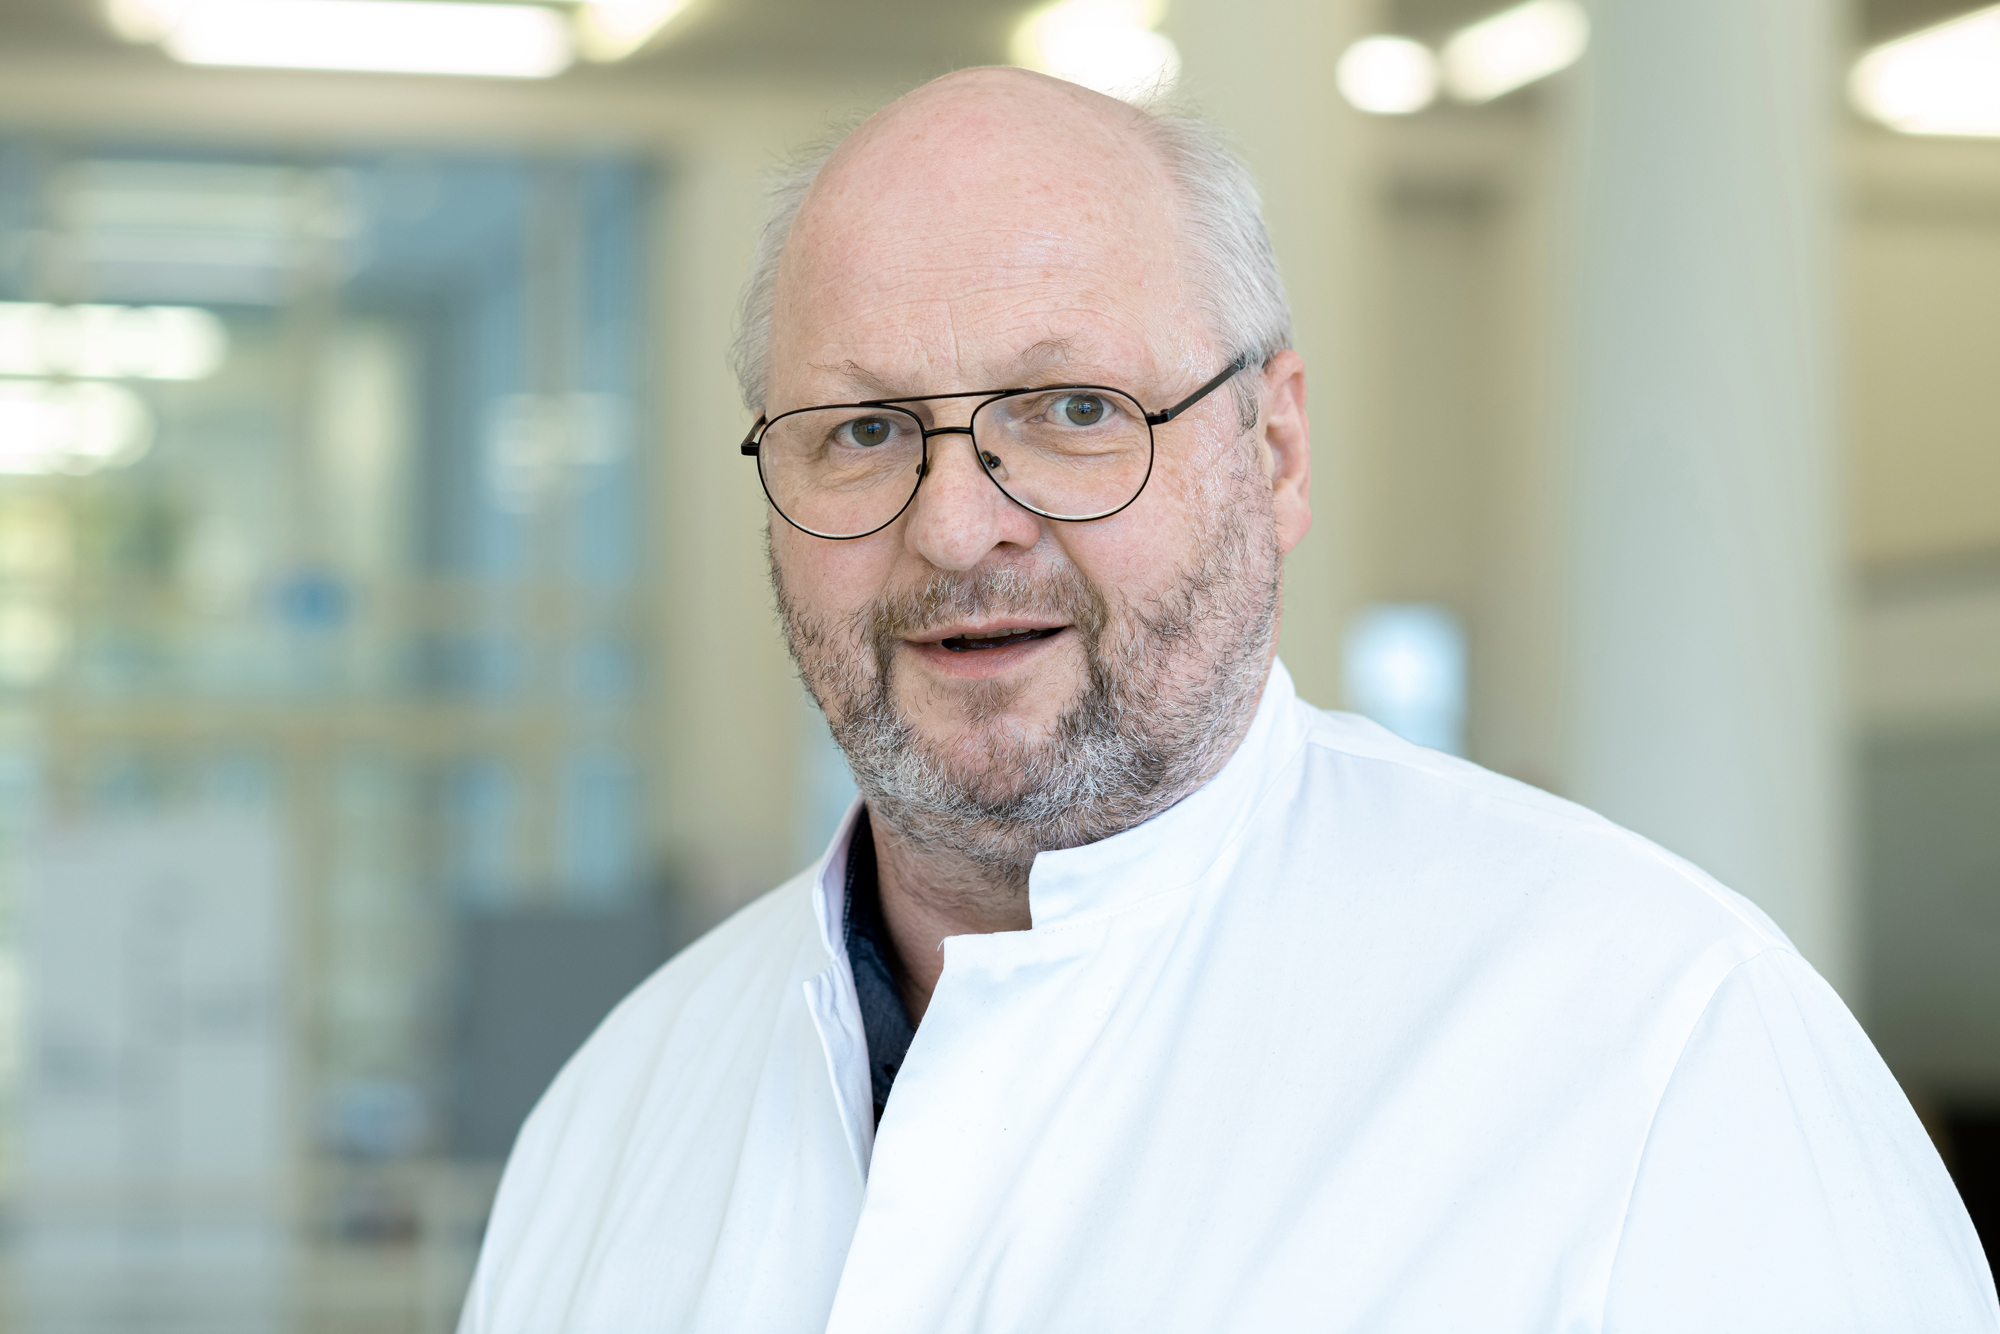 PD Dr. med. Jürgen Novotny